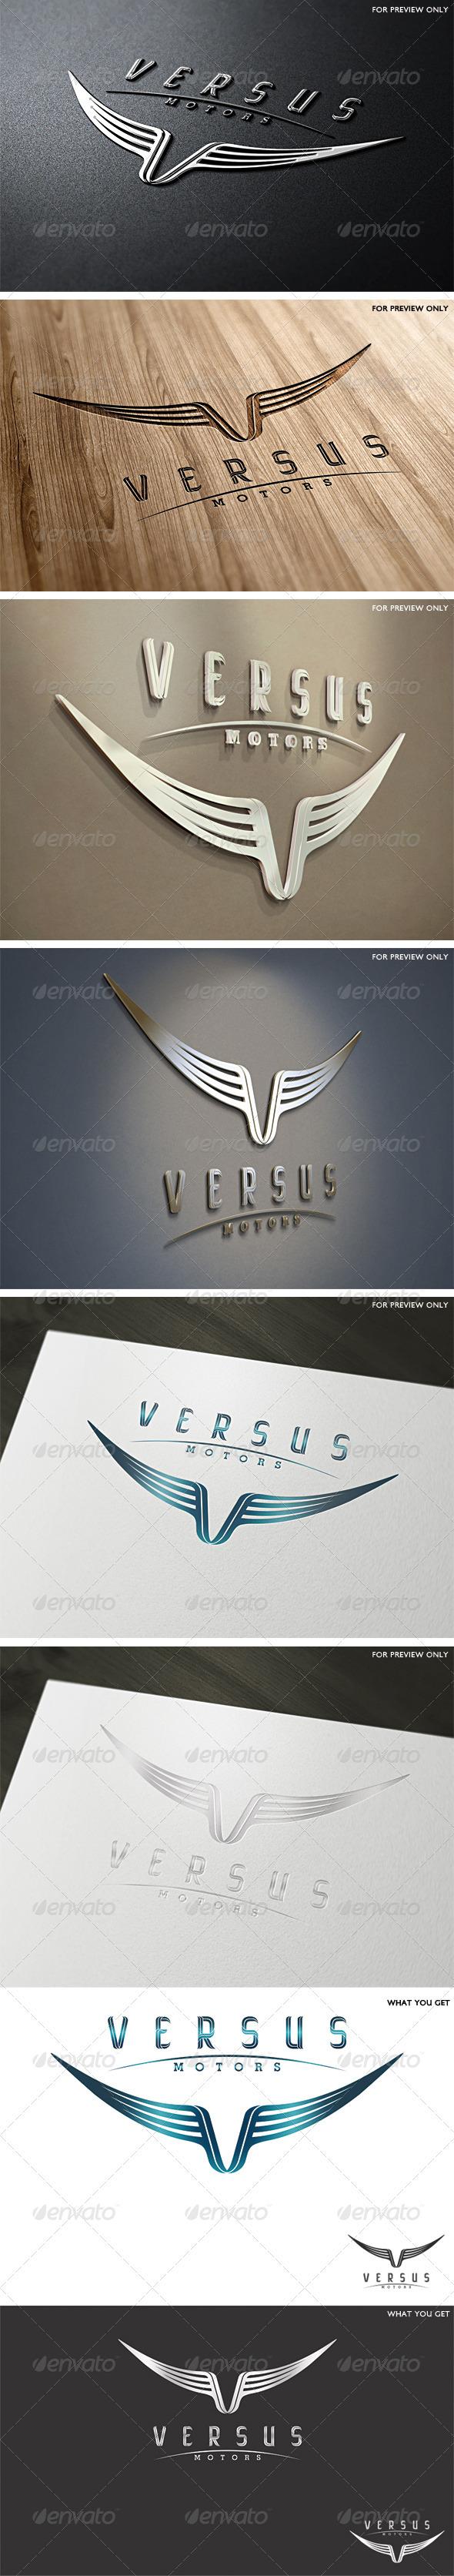 GraphicRiver Versus Motors Logo Template 2449902